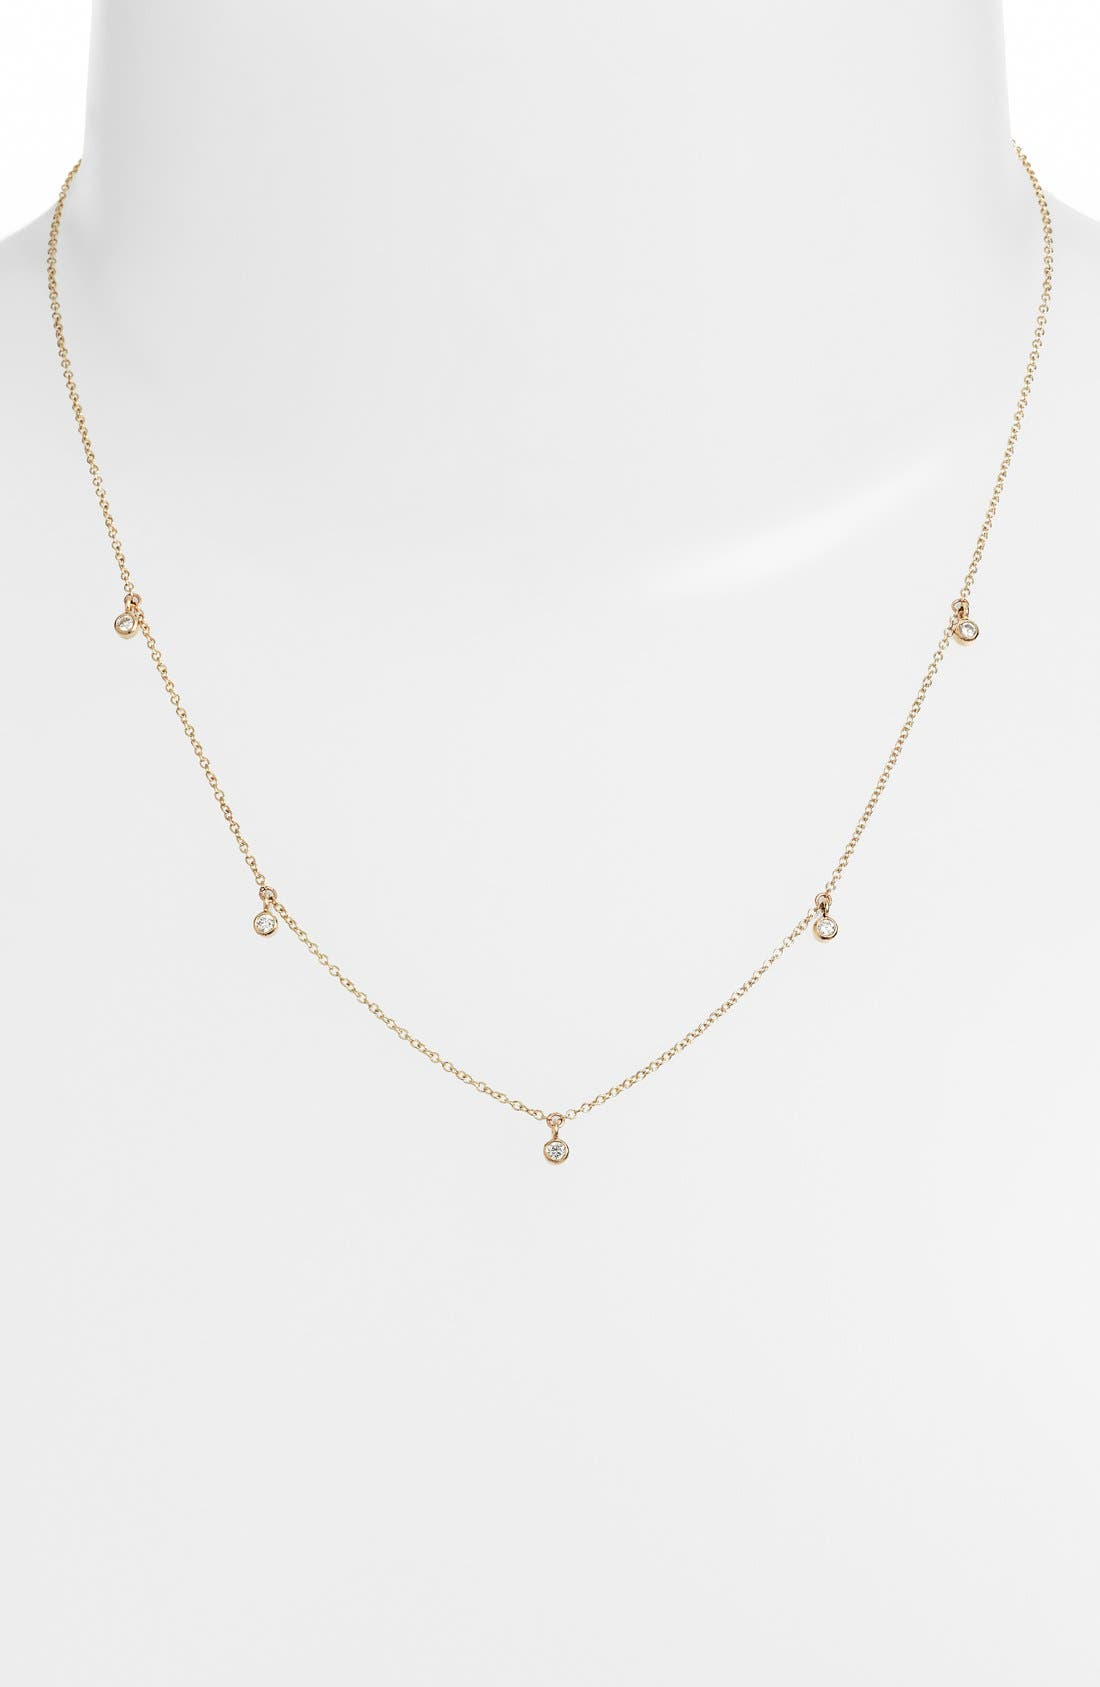 ZOË CHICCO Diamond Strand Necklace